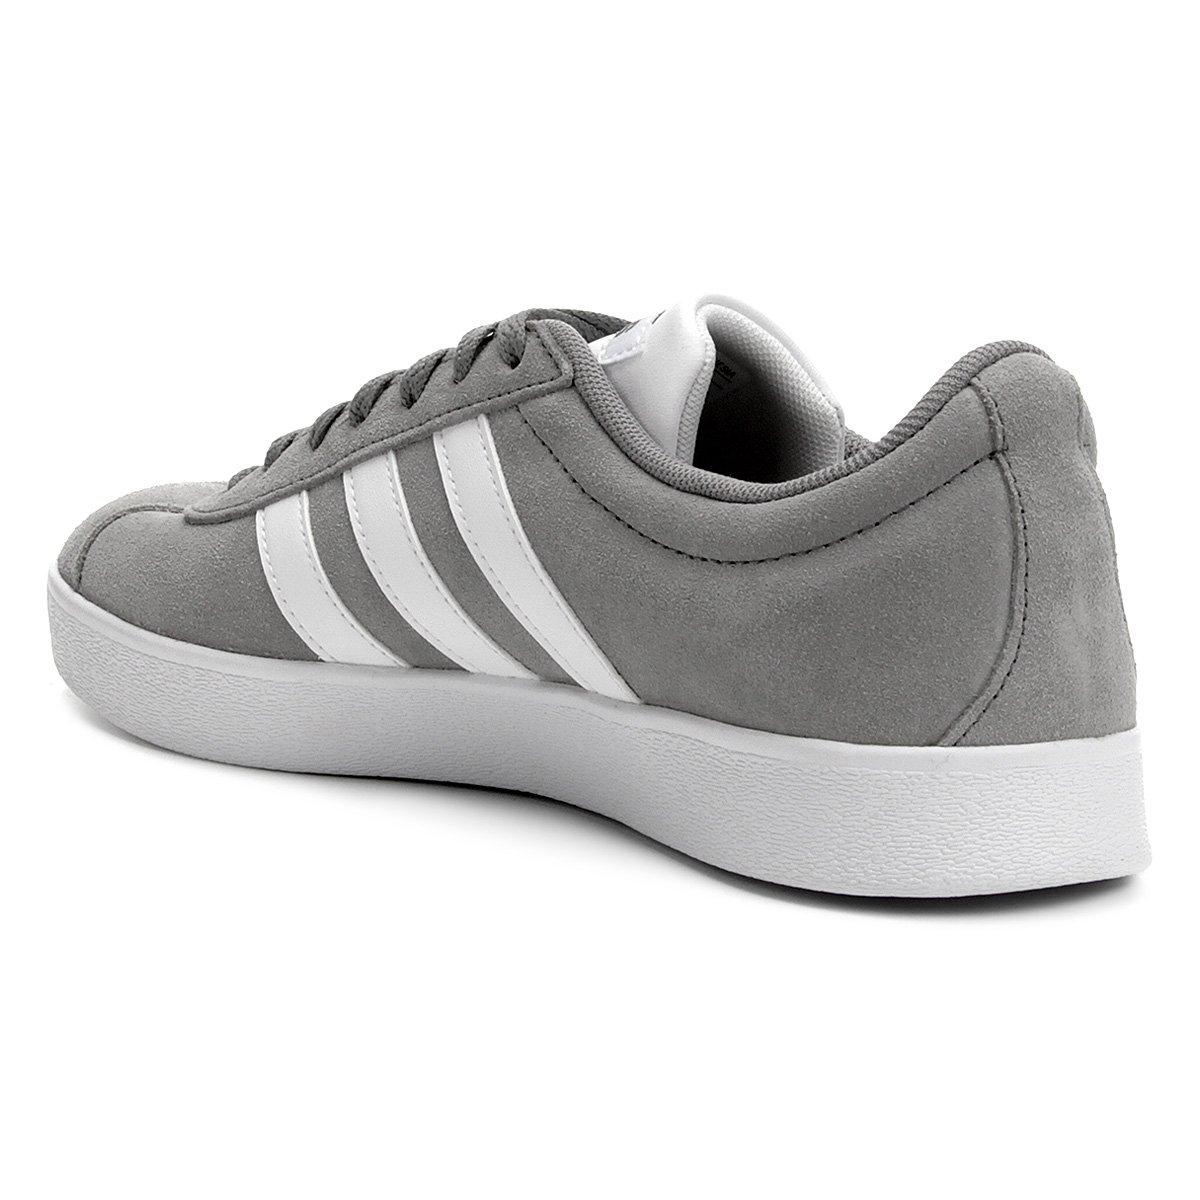 Tênis Adidas Vl Court 2.0 Masculino Cinza